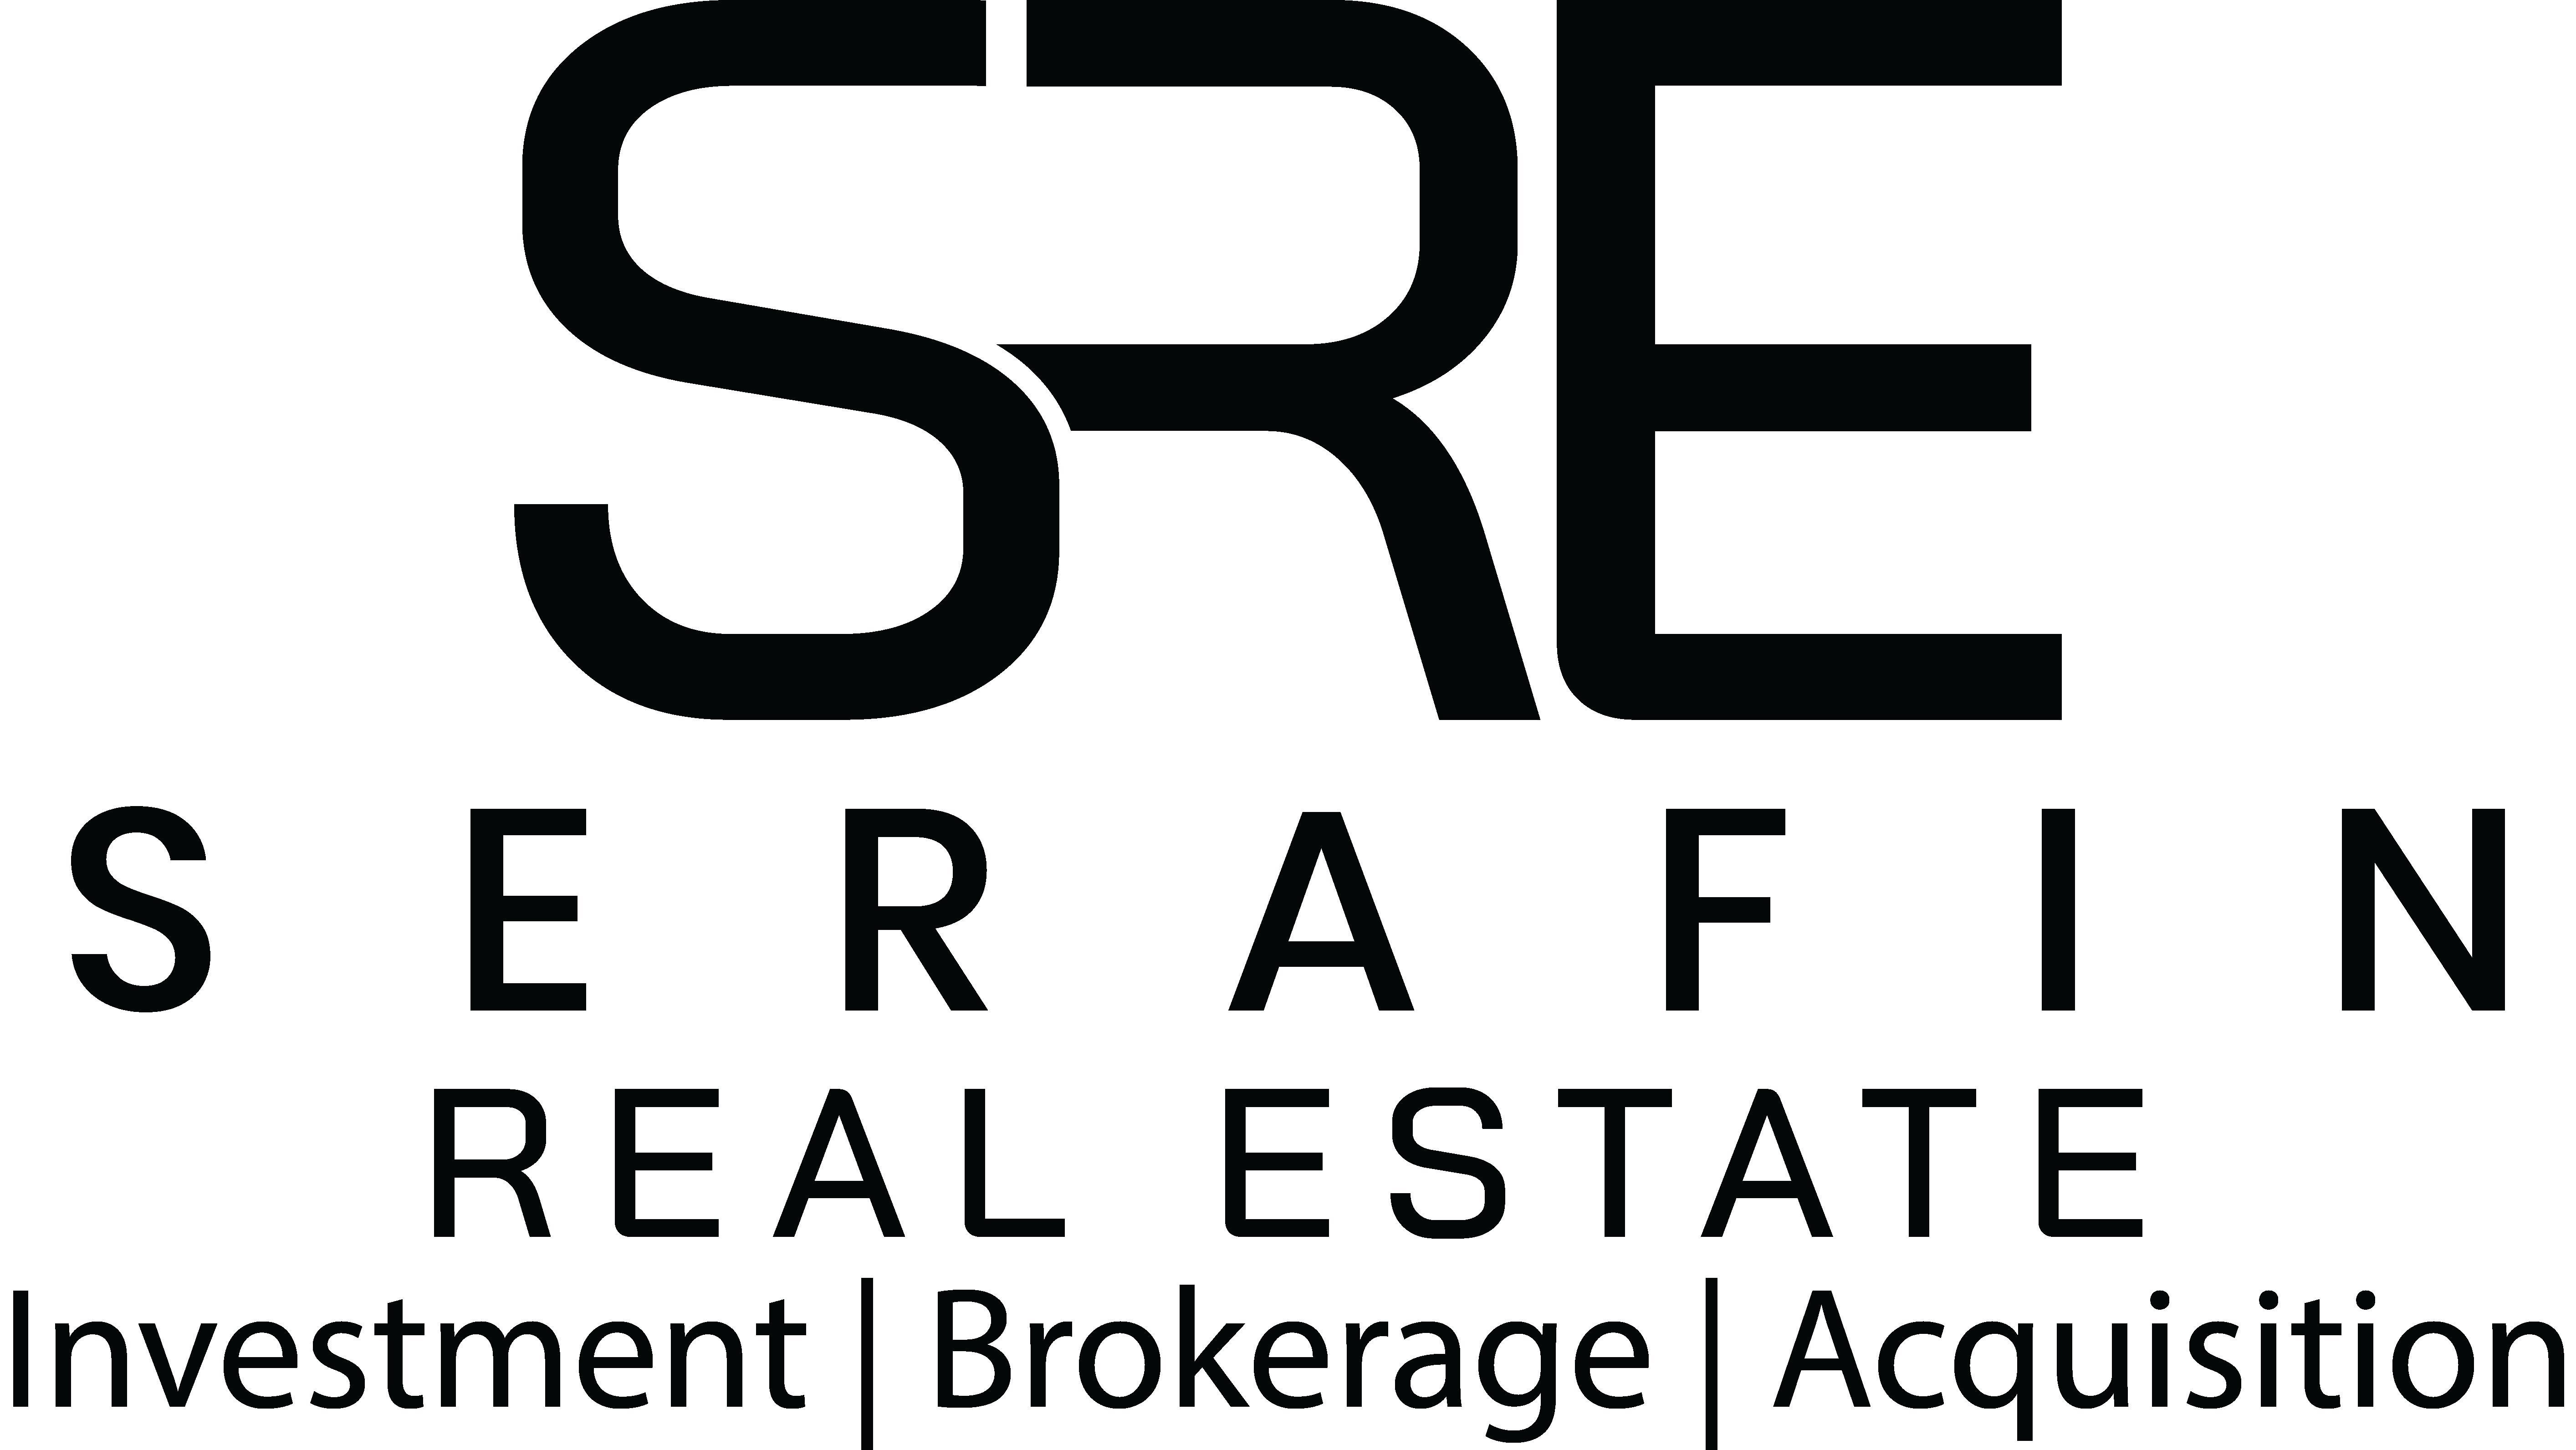 Serafin Real Estate